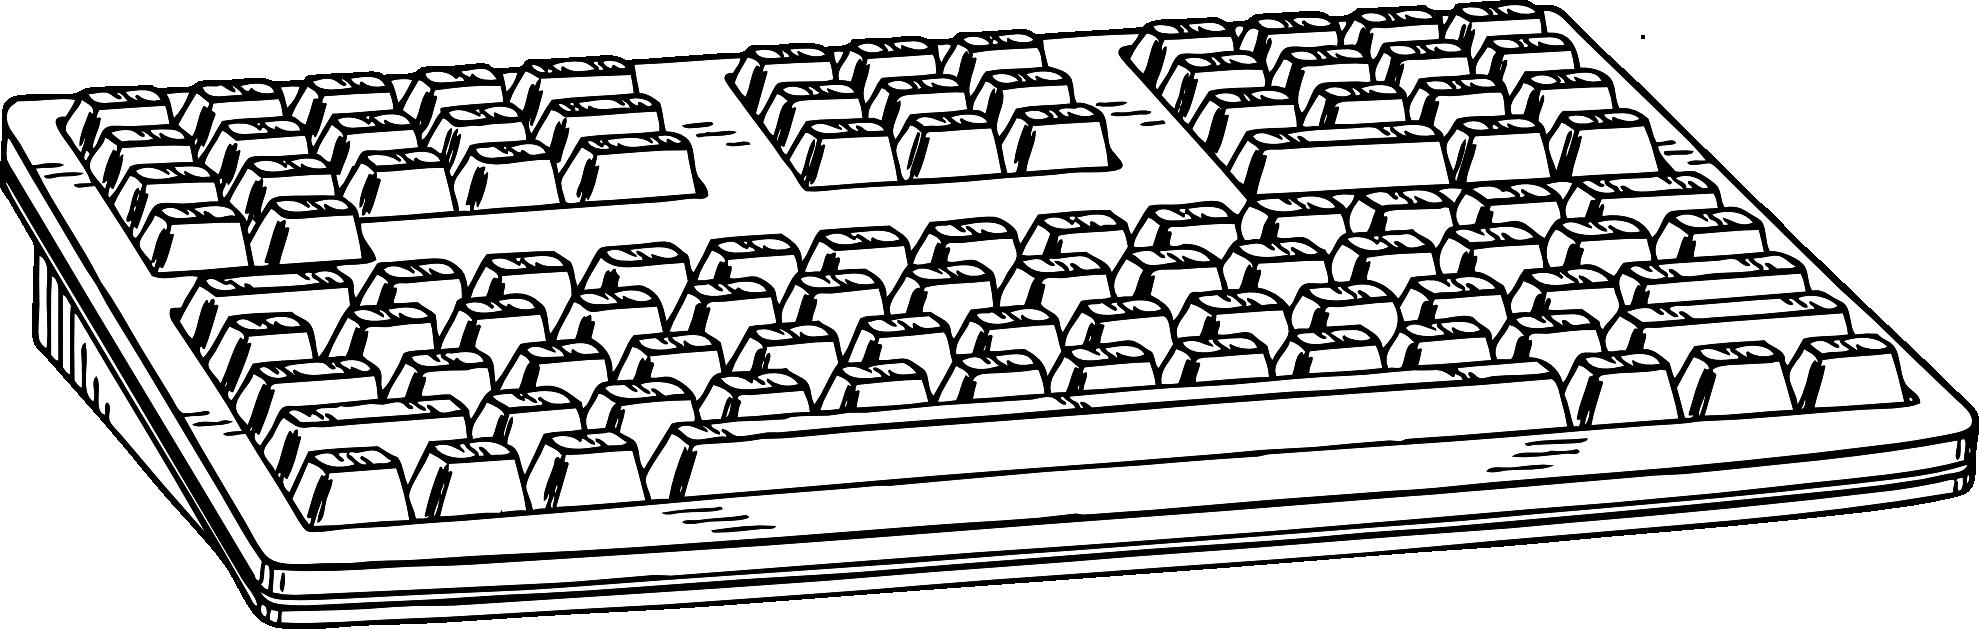 Blank computer keyboard clipart clip art Dell Computer Keyboard Clipart Clip art of Keyboard Clipart #7313 ... clip art